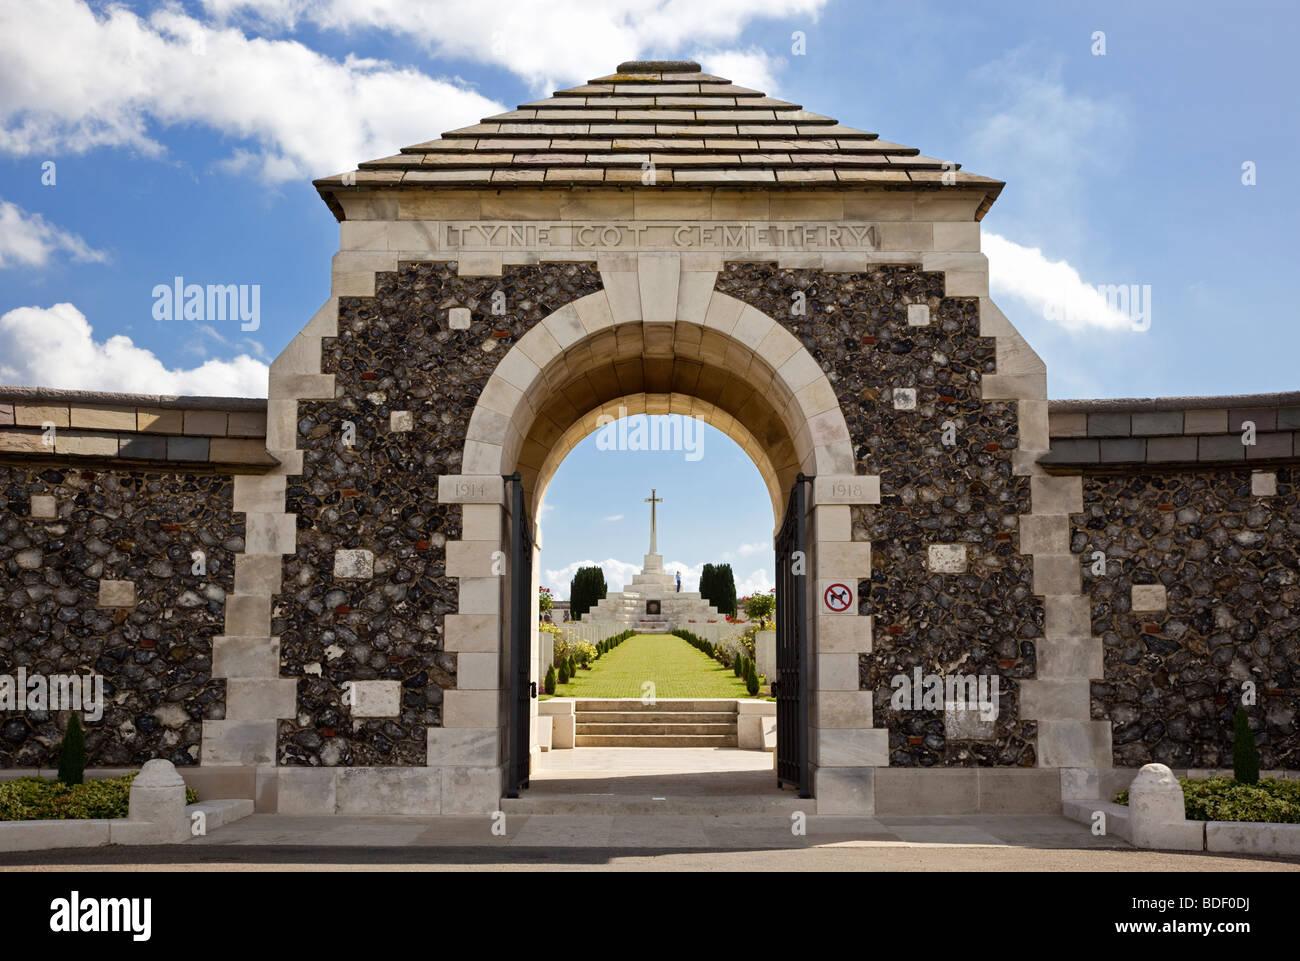 Tyne Cot WW1 World War 1 Commonwealth military cemetery at  Passchendaele, Flanders, Belgium, Europe - Stock Image